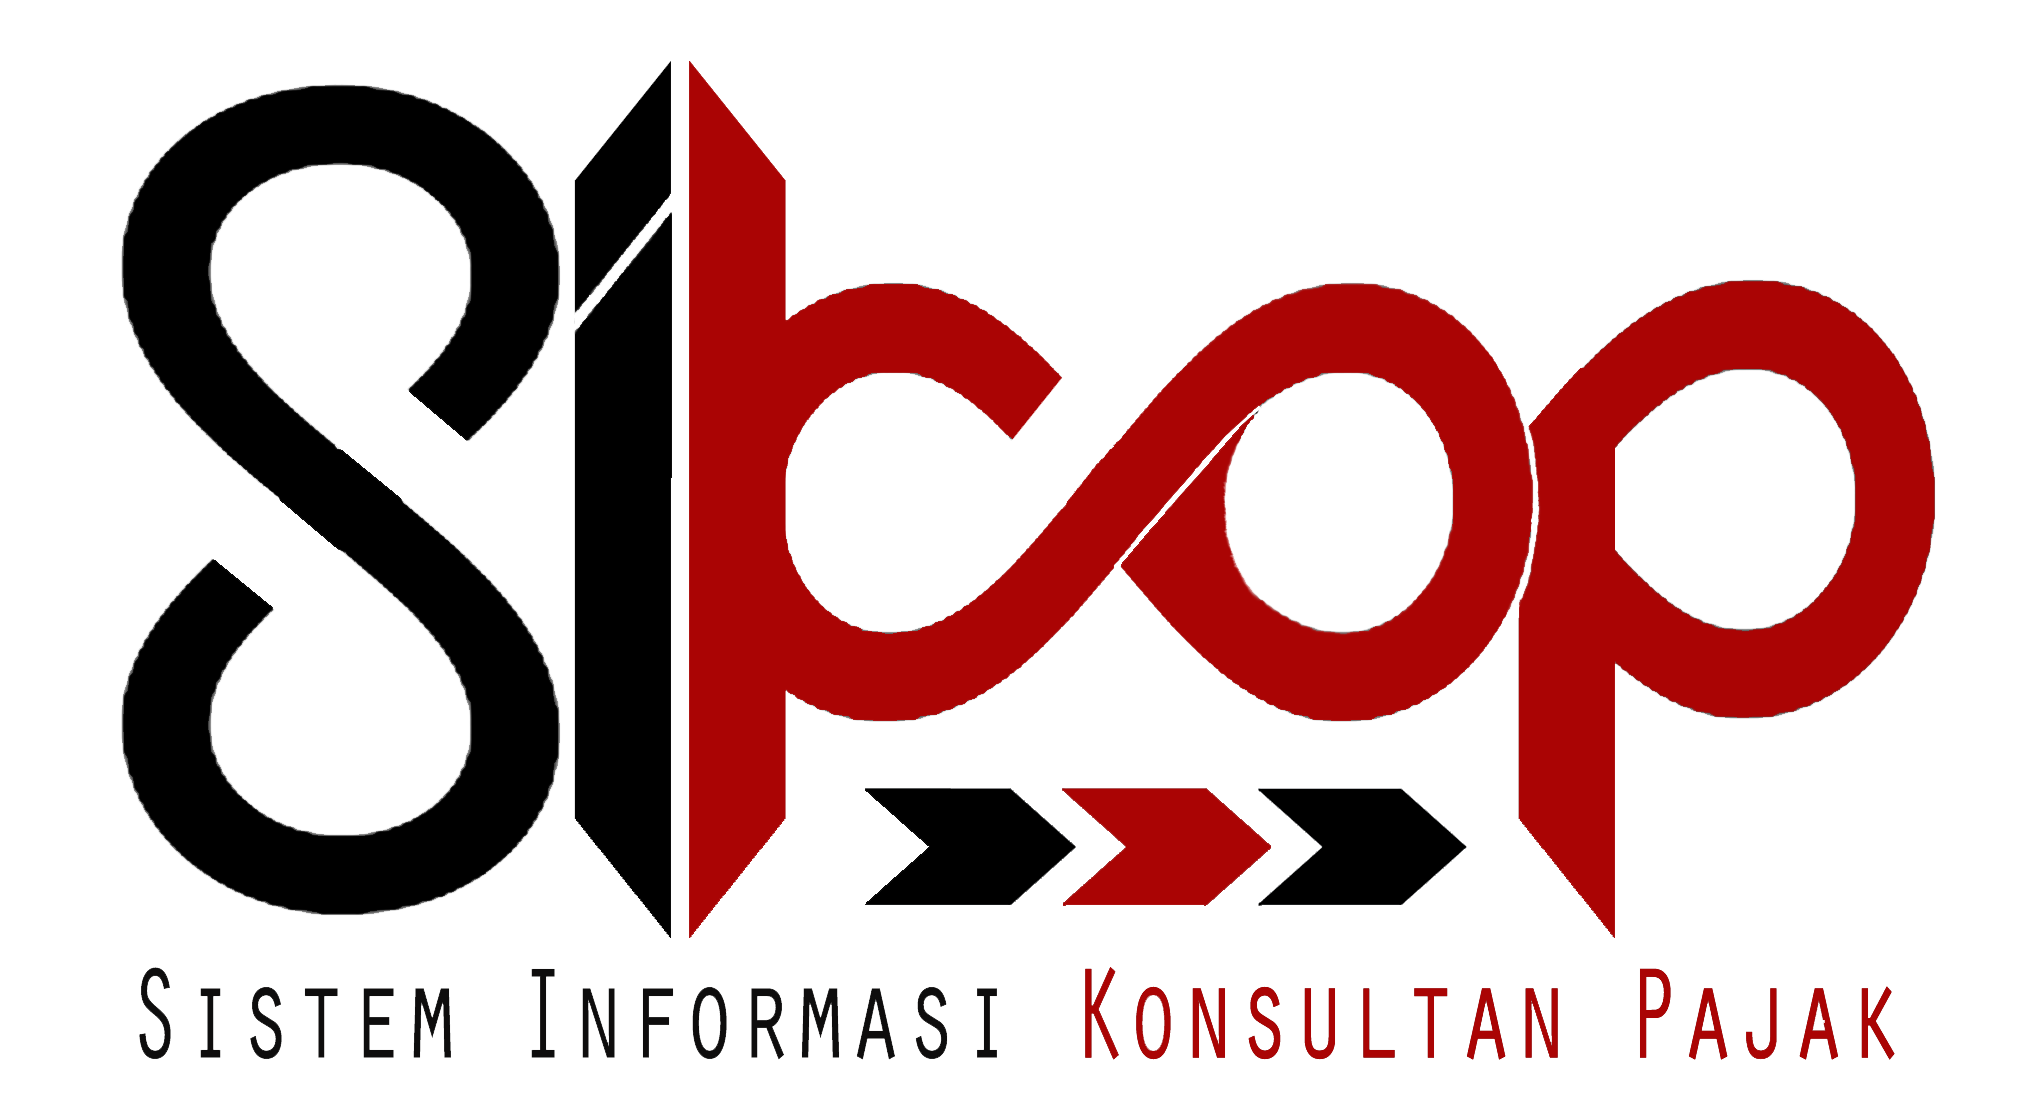 Sosialisasi Kewajiban Pengisian Laporan Tahunan Konsultan Pajak (SIKOP)